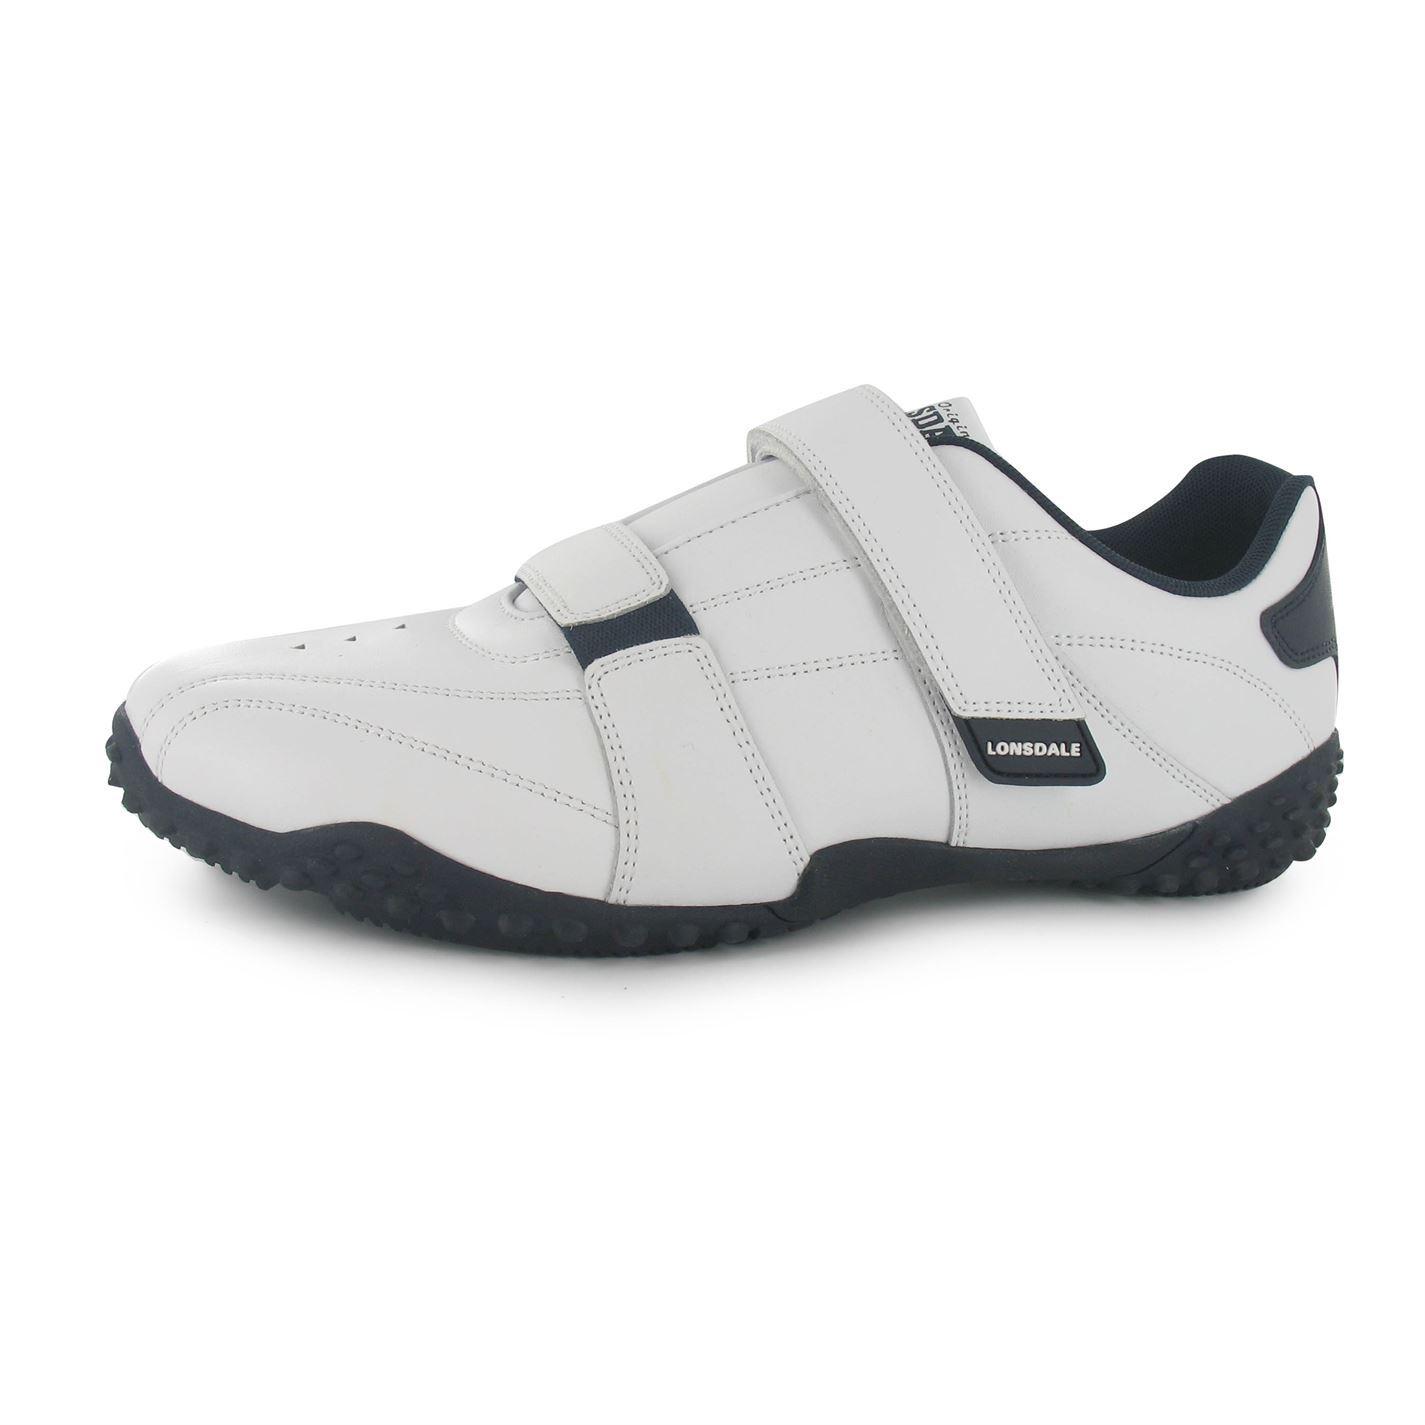 Lonsdale Fulham Trainers Uomo White/Navy Casual Scarpe da Ginnastica Scarpe Footwear